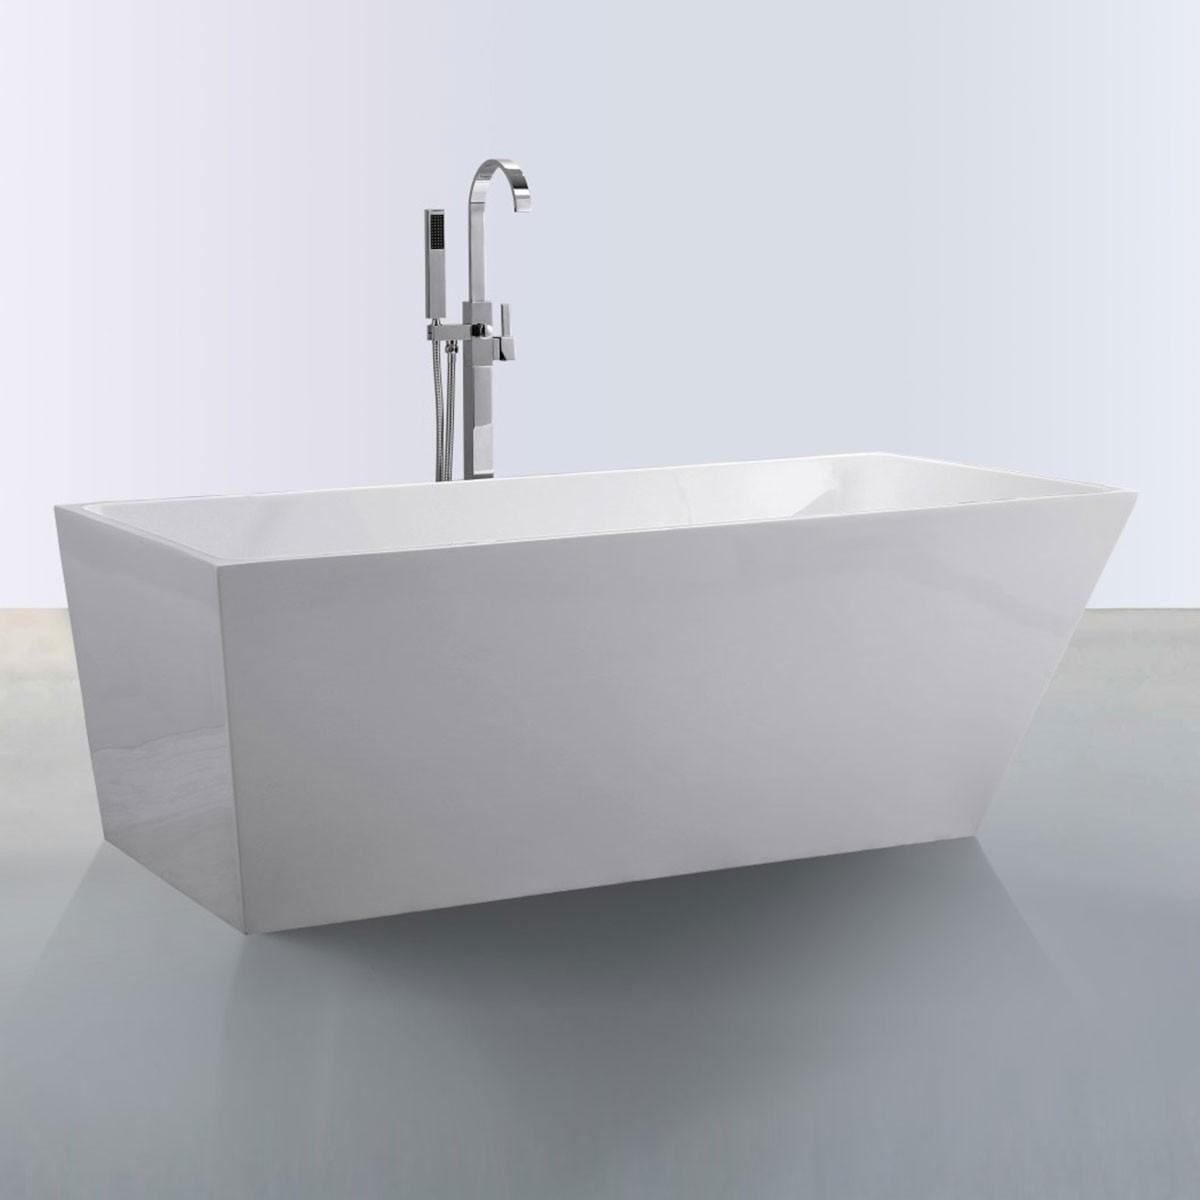 59 In Freestanding Bathtub - Acrylic White (DK-SLD-YG870-15)